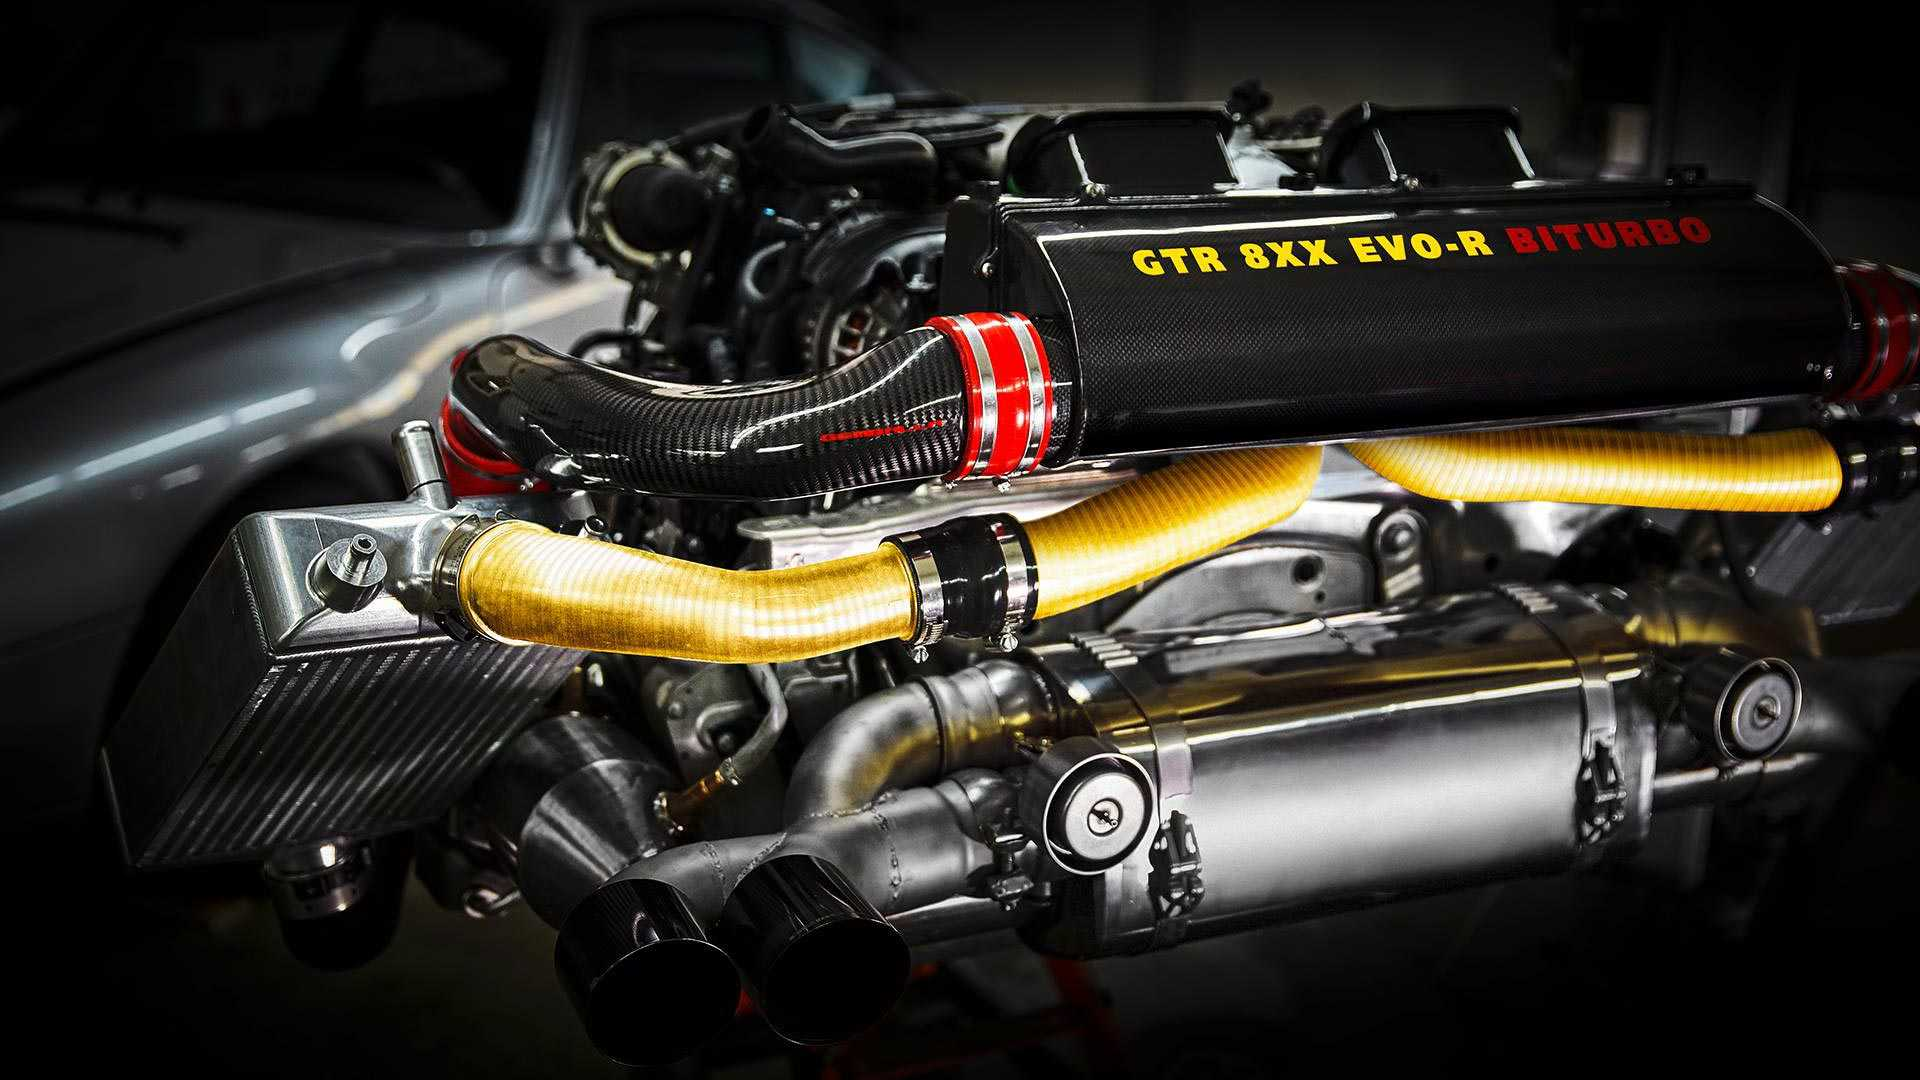 porsche-911-turbo-gemballa-gtr-8xx-evo-r (3)